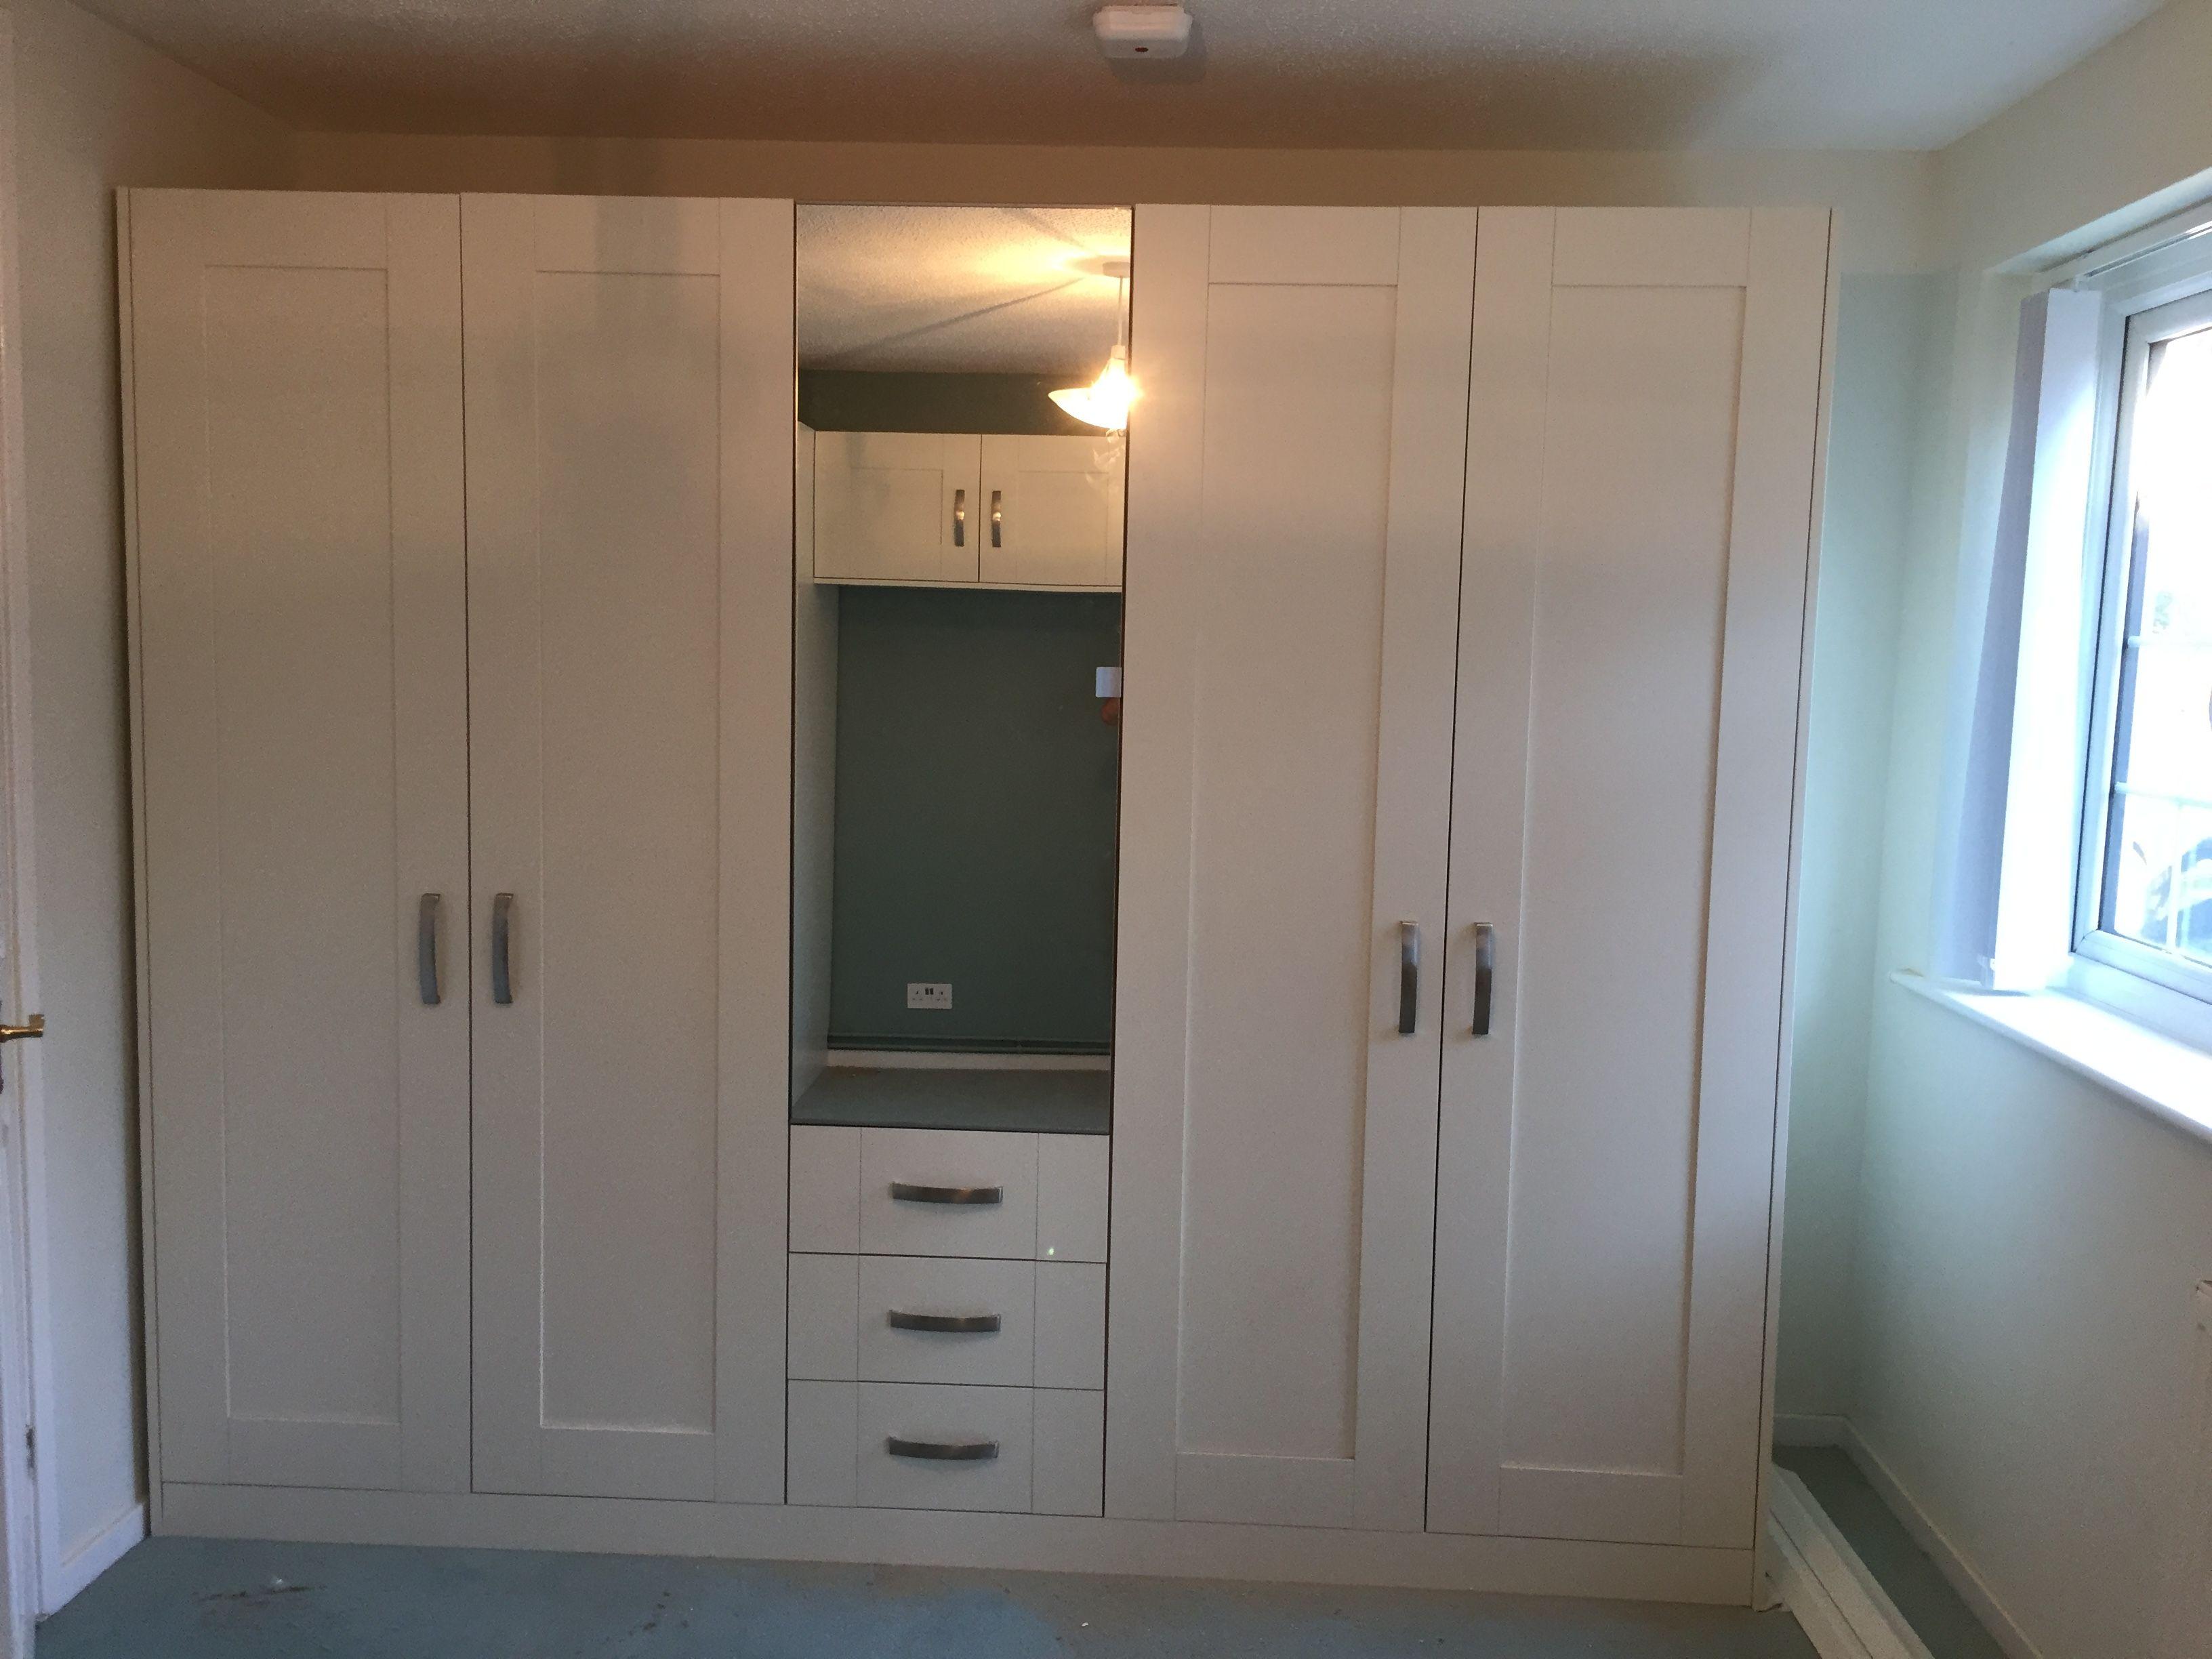 schreiber wardrobe assembled by wwwppflatpackcouk master bedrooms - Schreiber Fitted Bedroom Furniture Uk